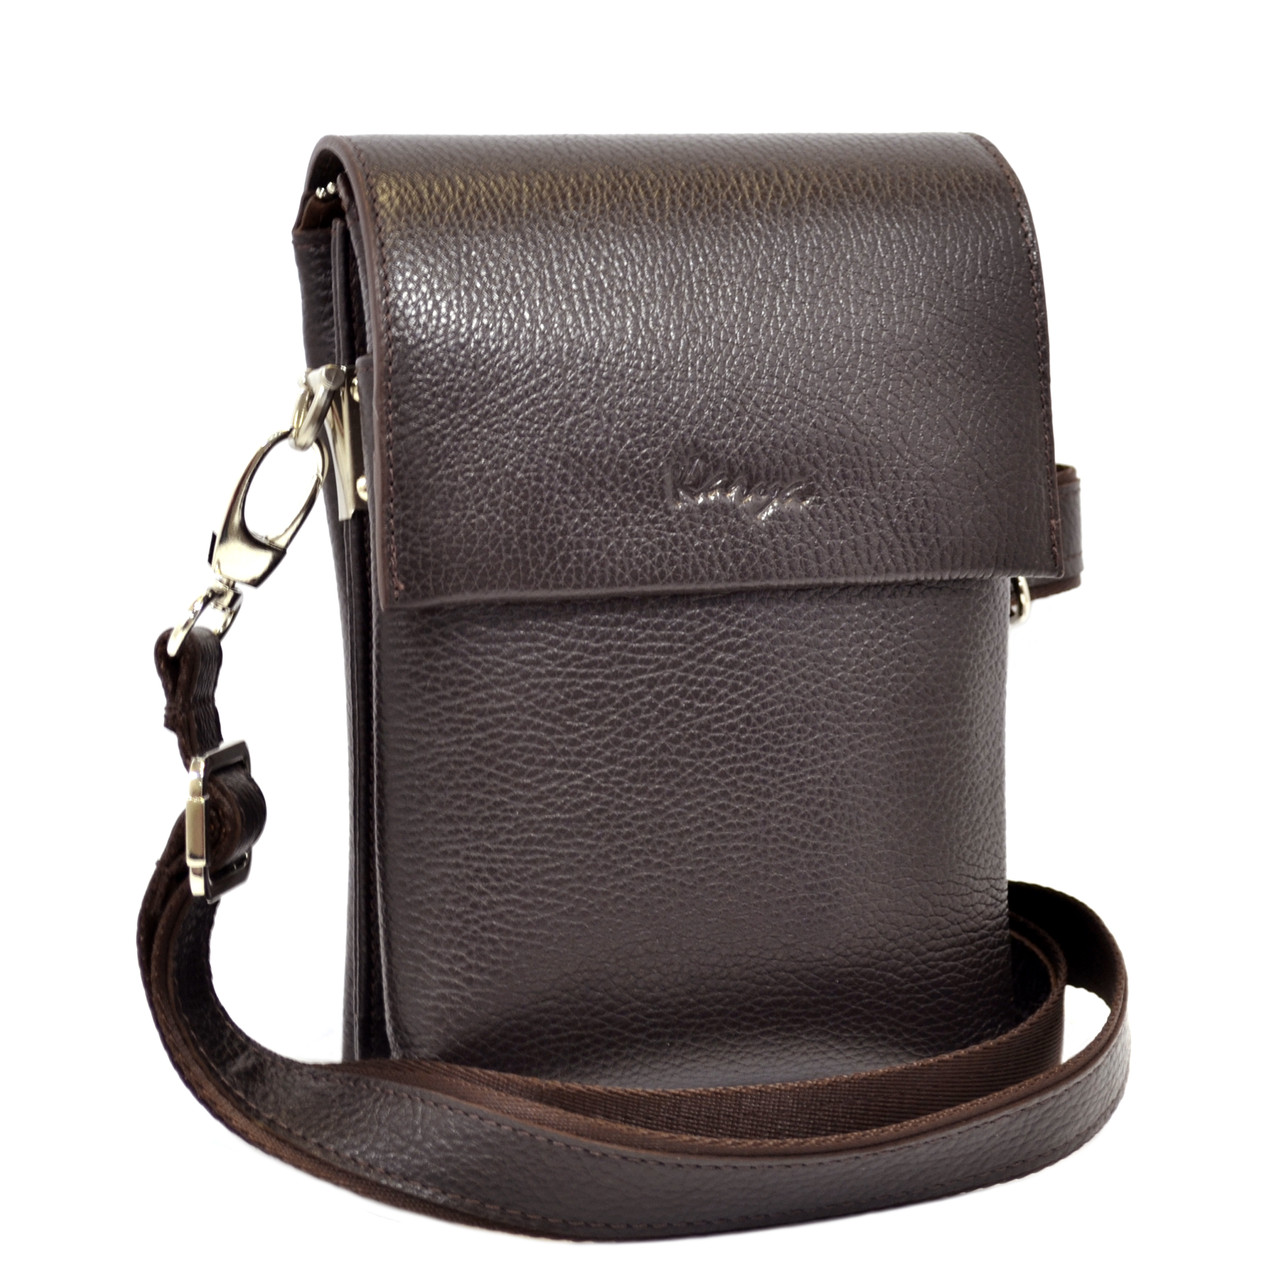 4bdd7605be91 Кожаная мужская сумка через плечо Karya - Интернет-магазин